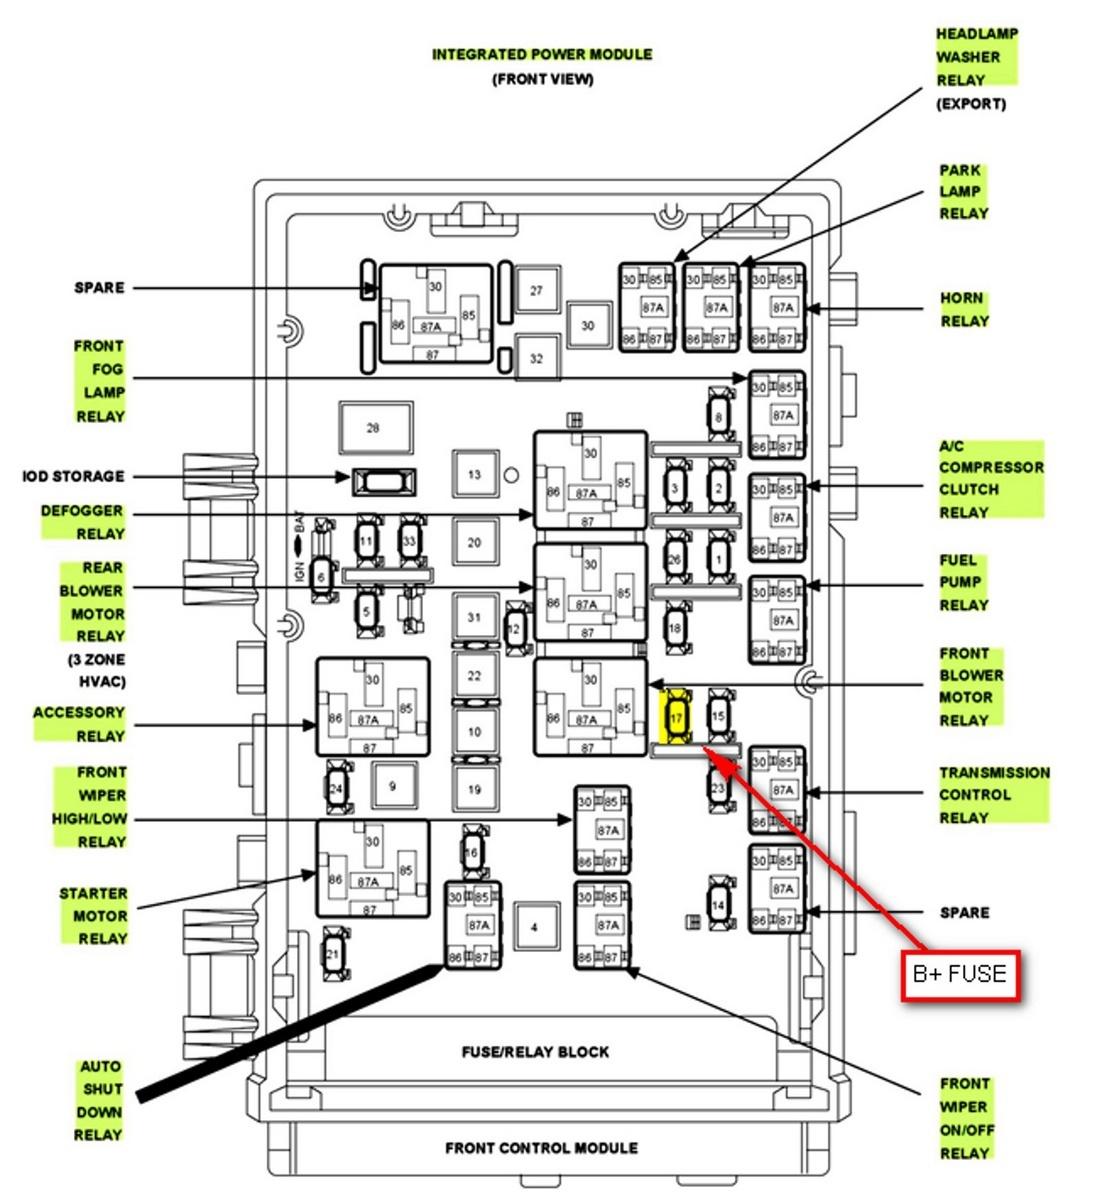 07 pt cruiser fuse diagram | wiring blog refund  wiring diagram library